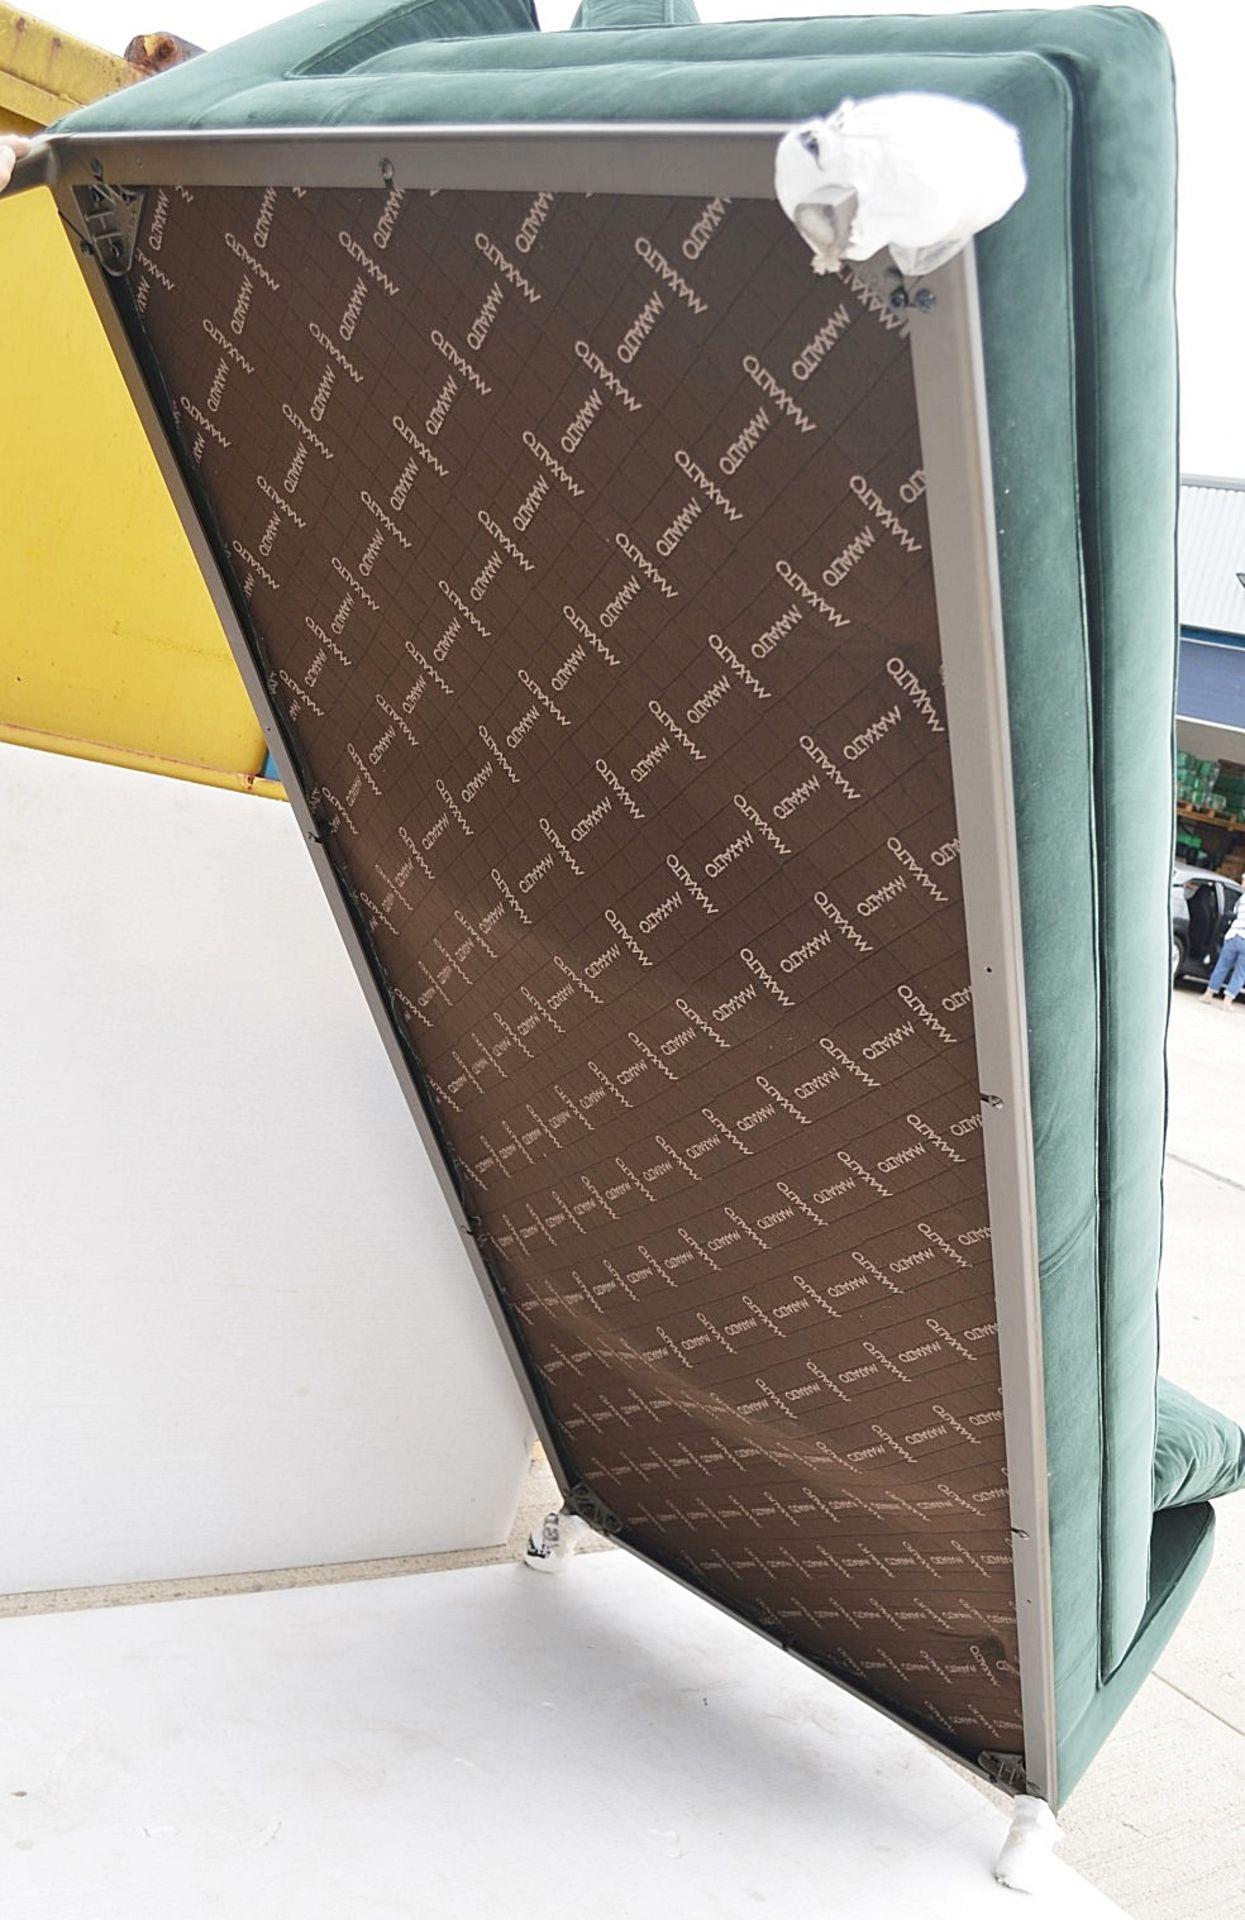 2 x B&B Italia MAXALTO Luxury Sofa Sections Both Upholstered In Rich Dark Green Velvet - RRP £7,248 - Image 7 of 13